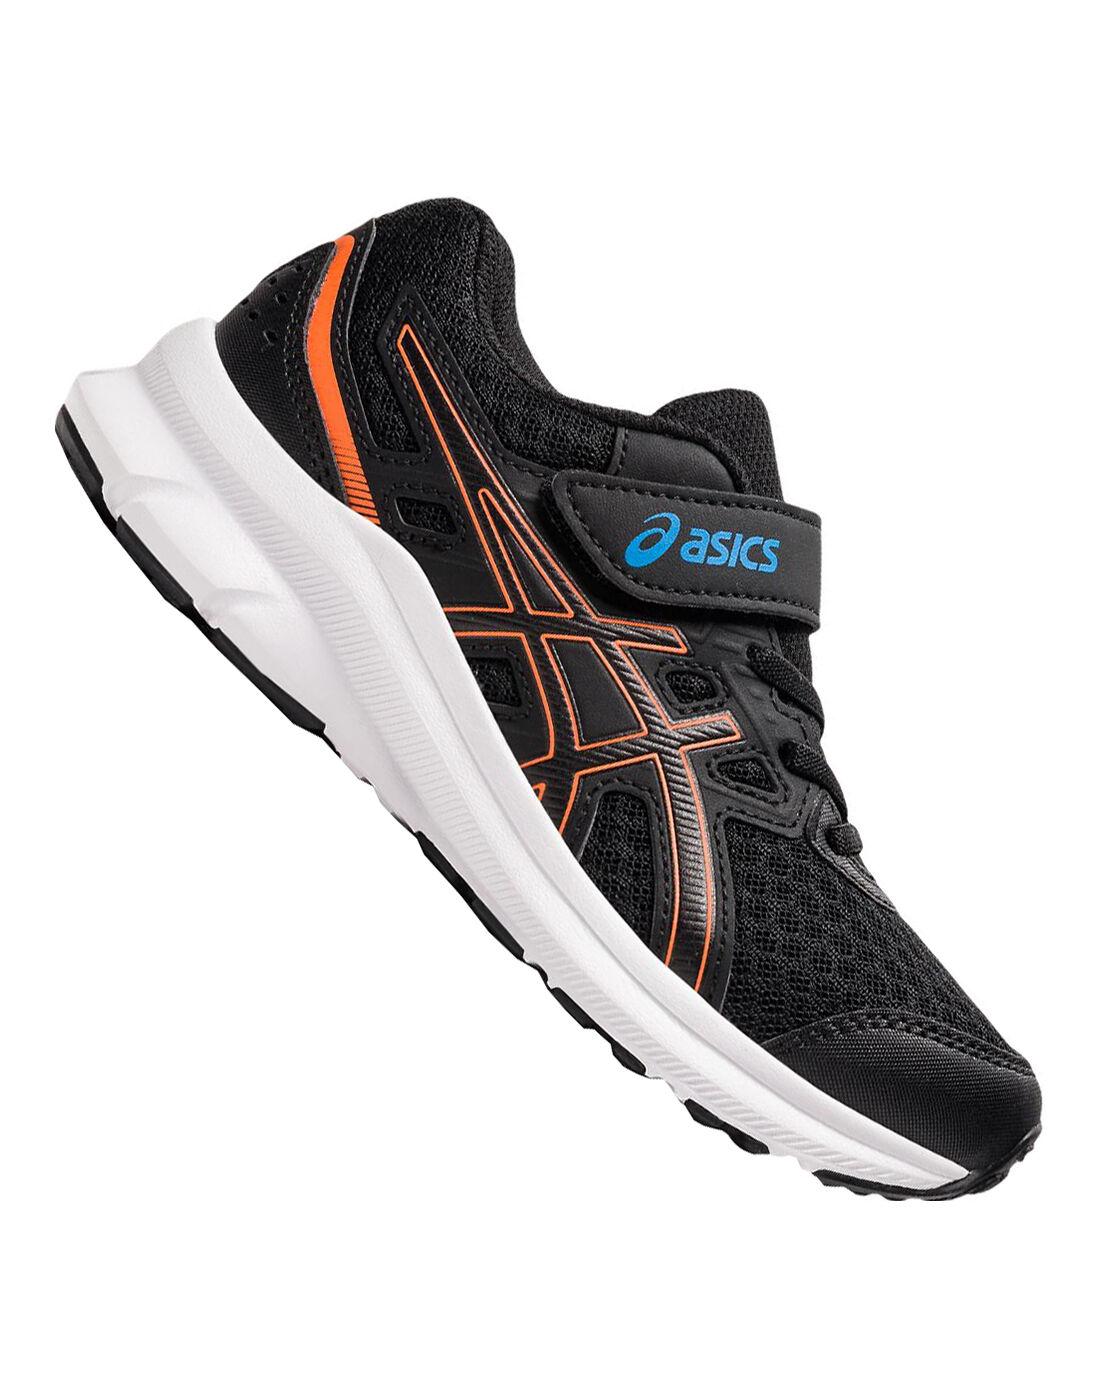 Asics adidas ng72 ebay women shoes sale 2 heel size   Younger Boys Jolt 3